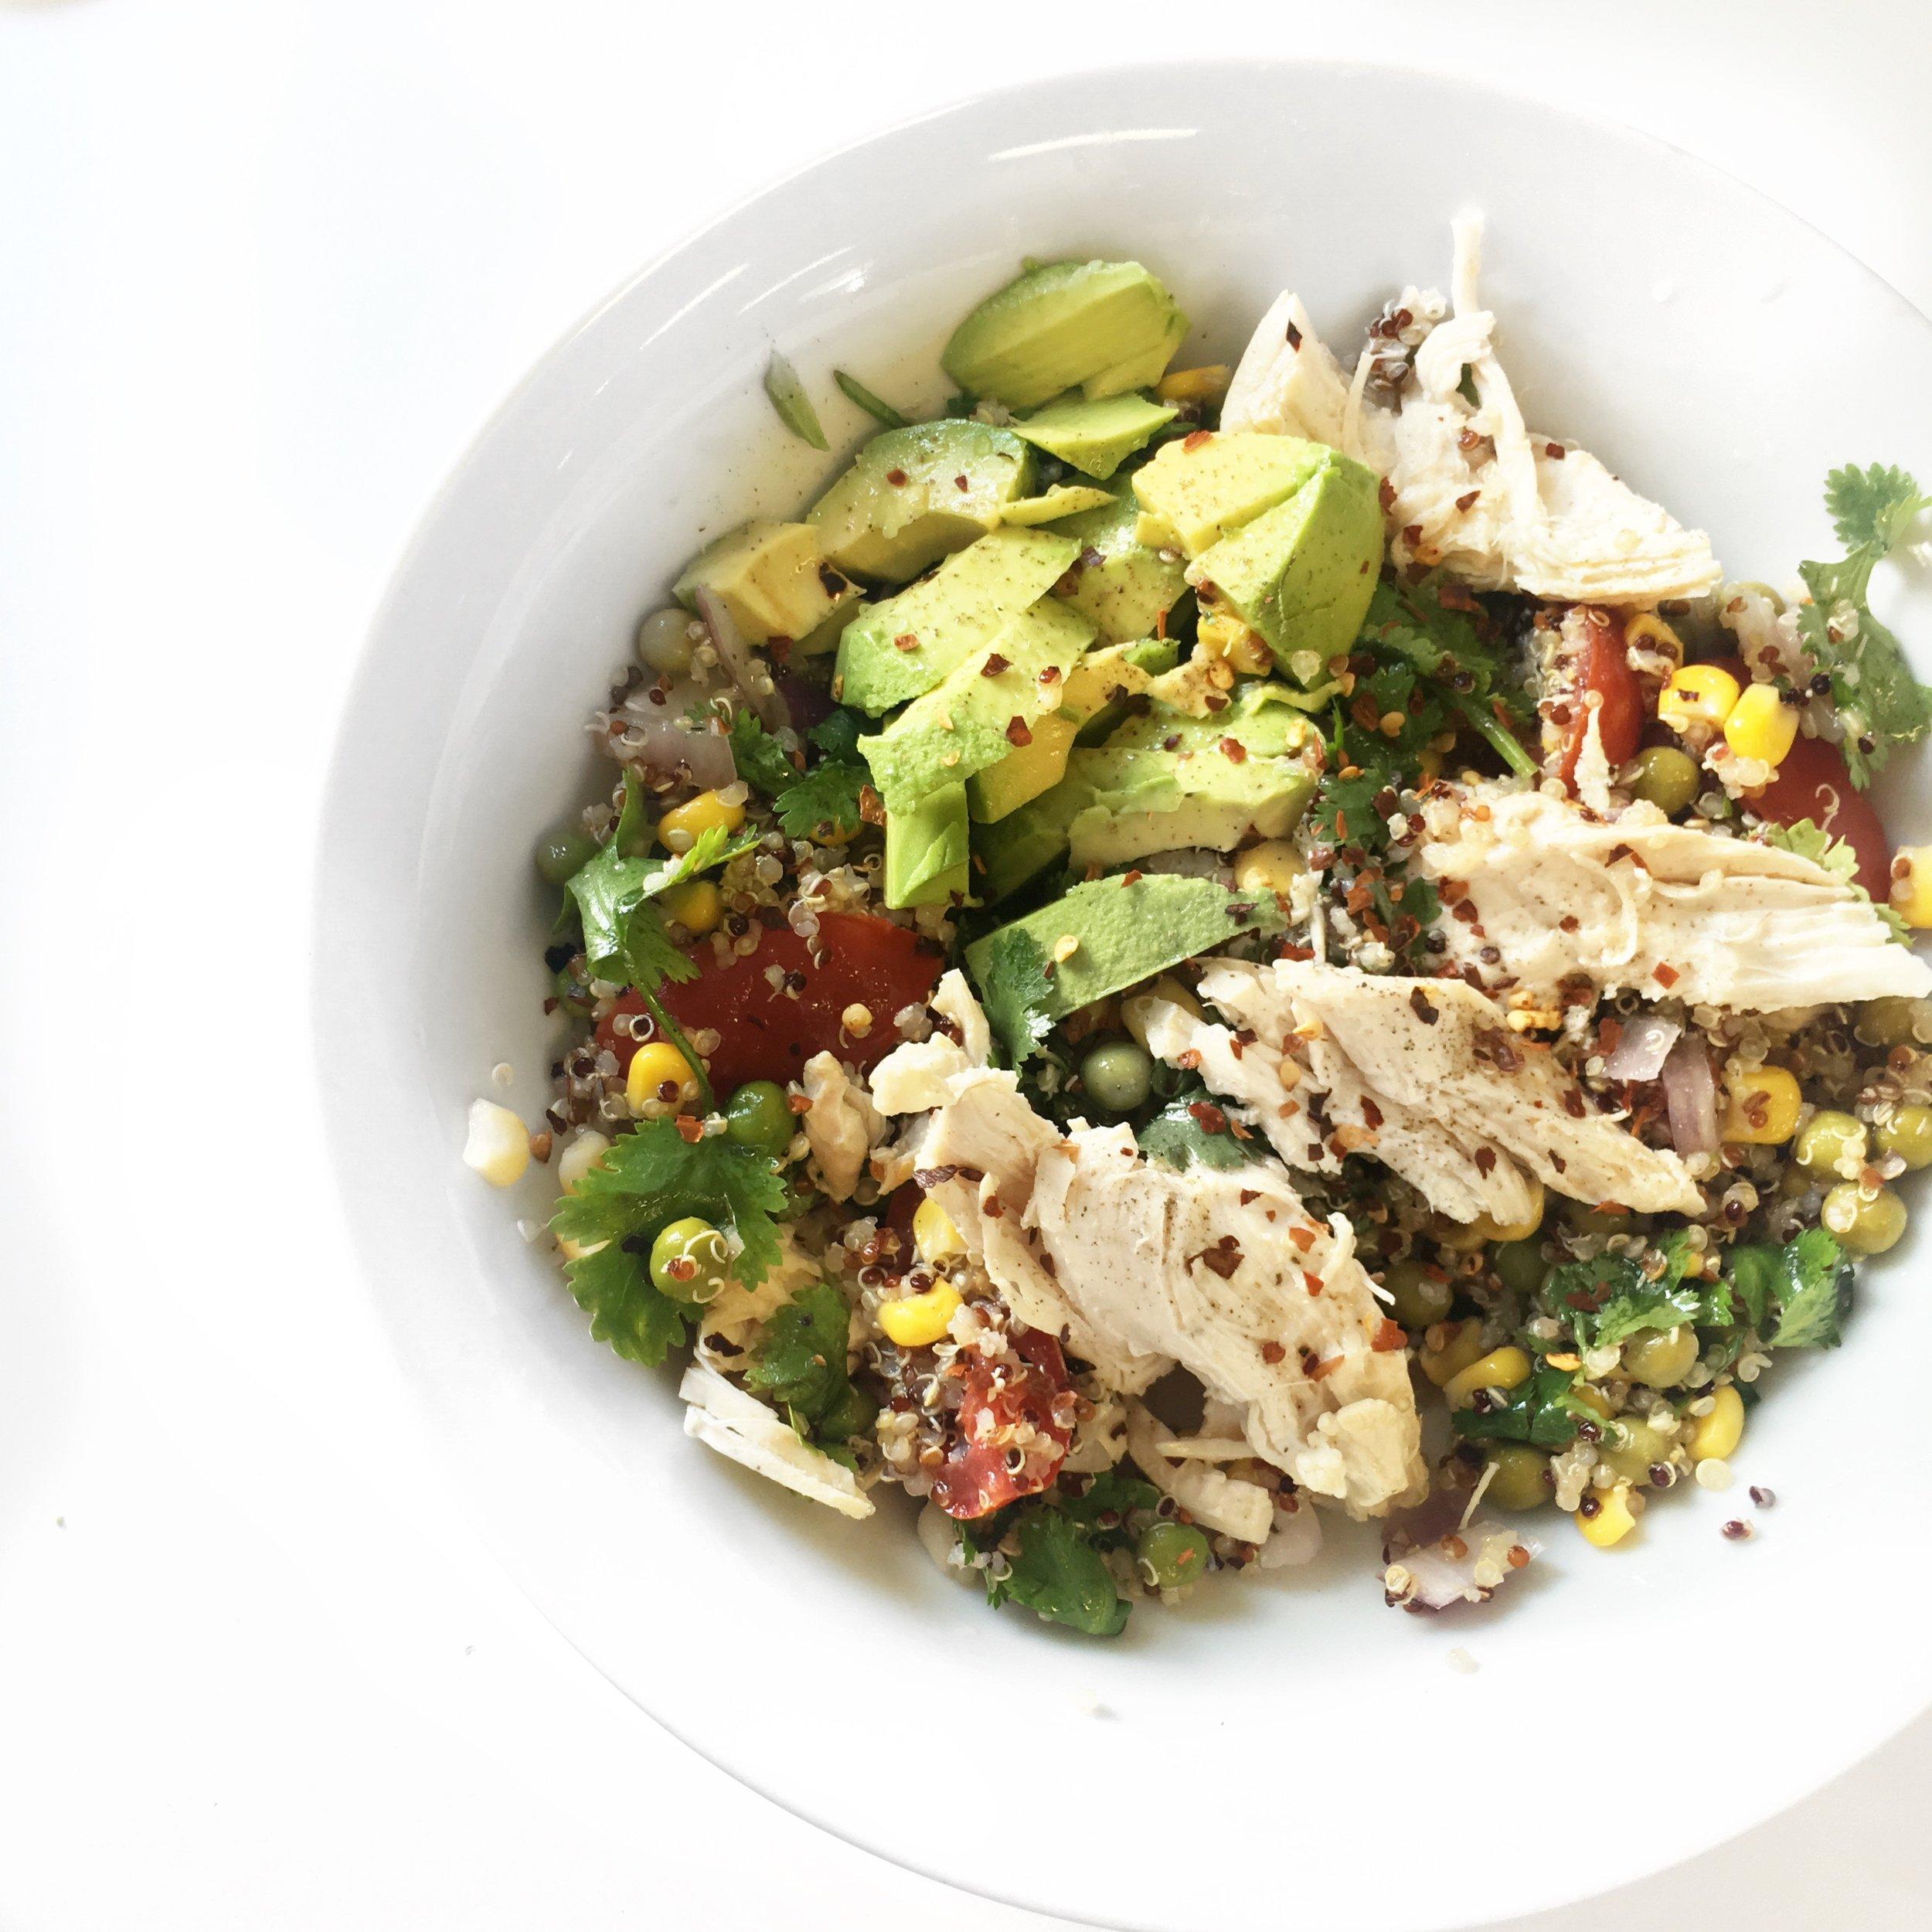 Meal-Prep_Chicken-Mexican-Salad4.jpg